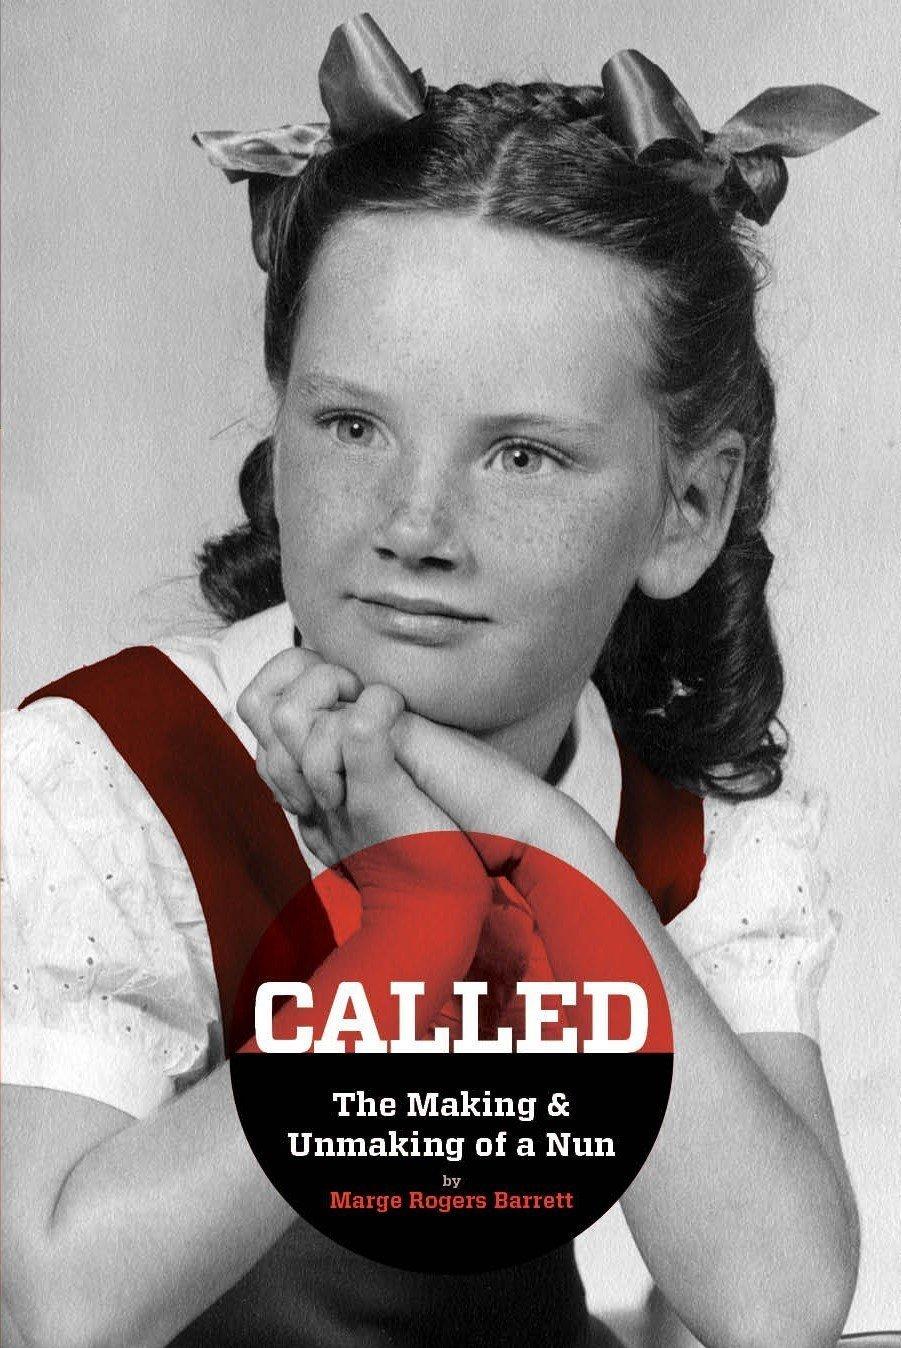 Called: The Making & Unmaking of a Nun - Memoir